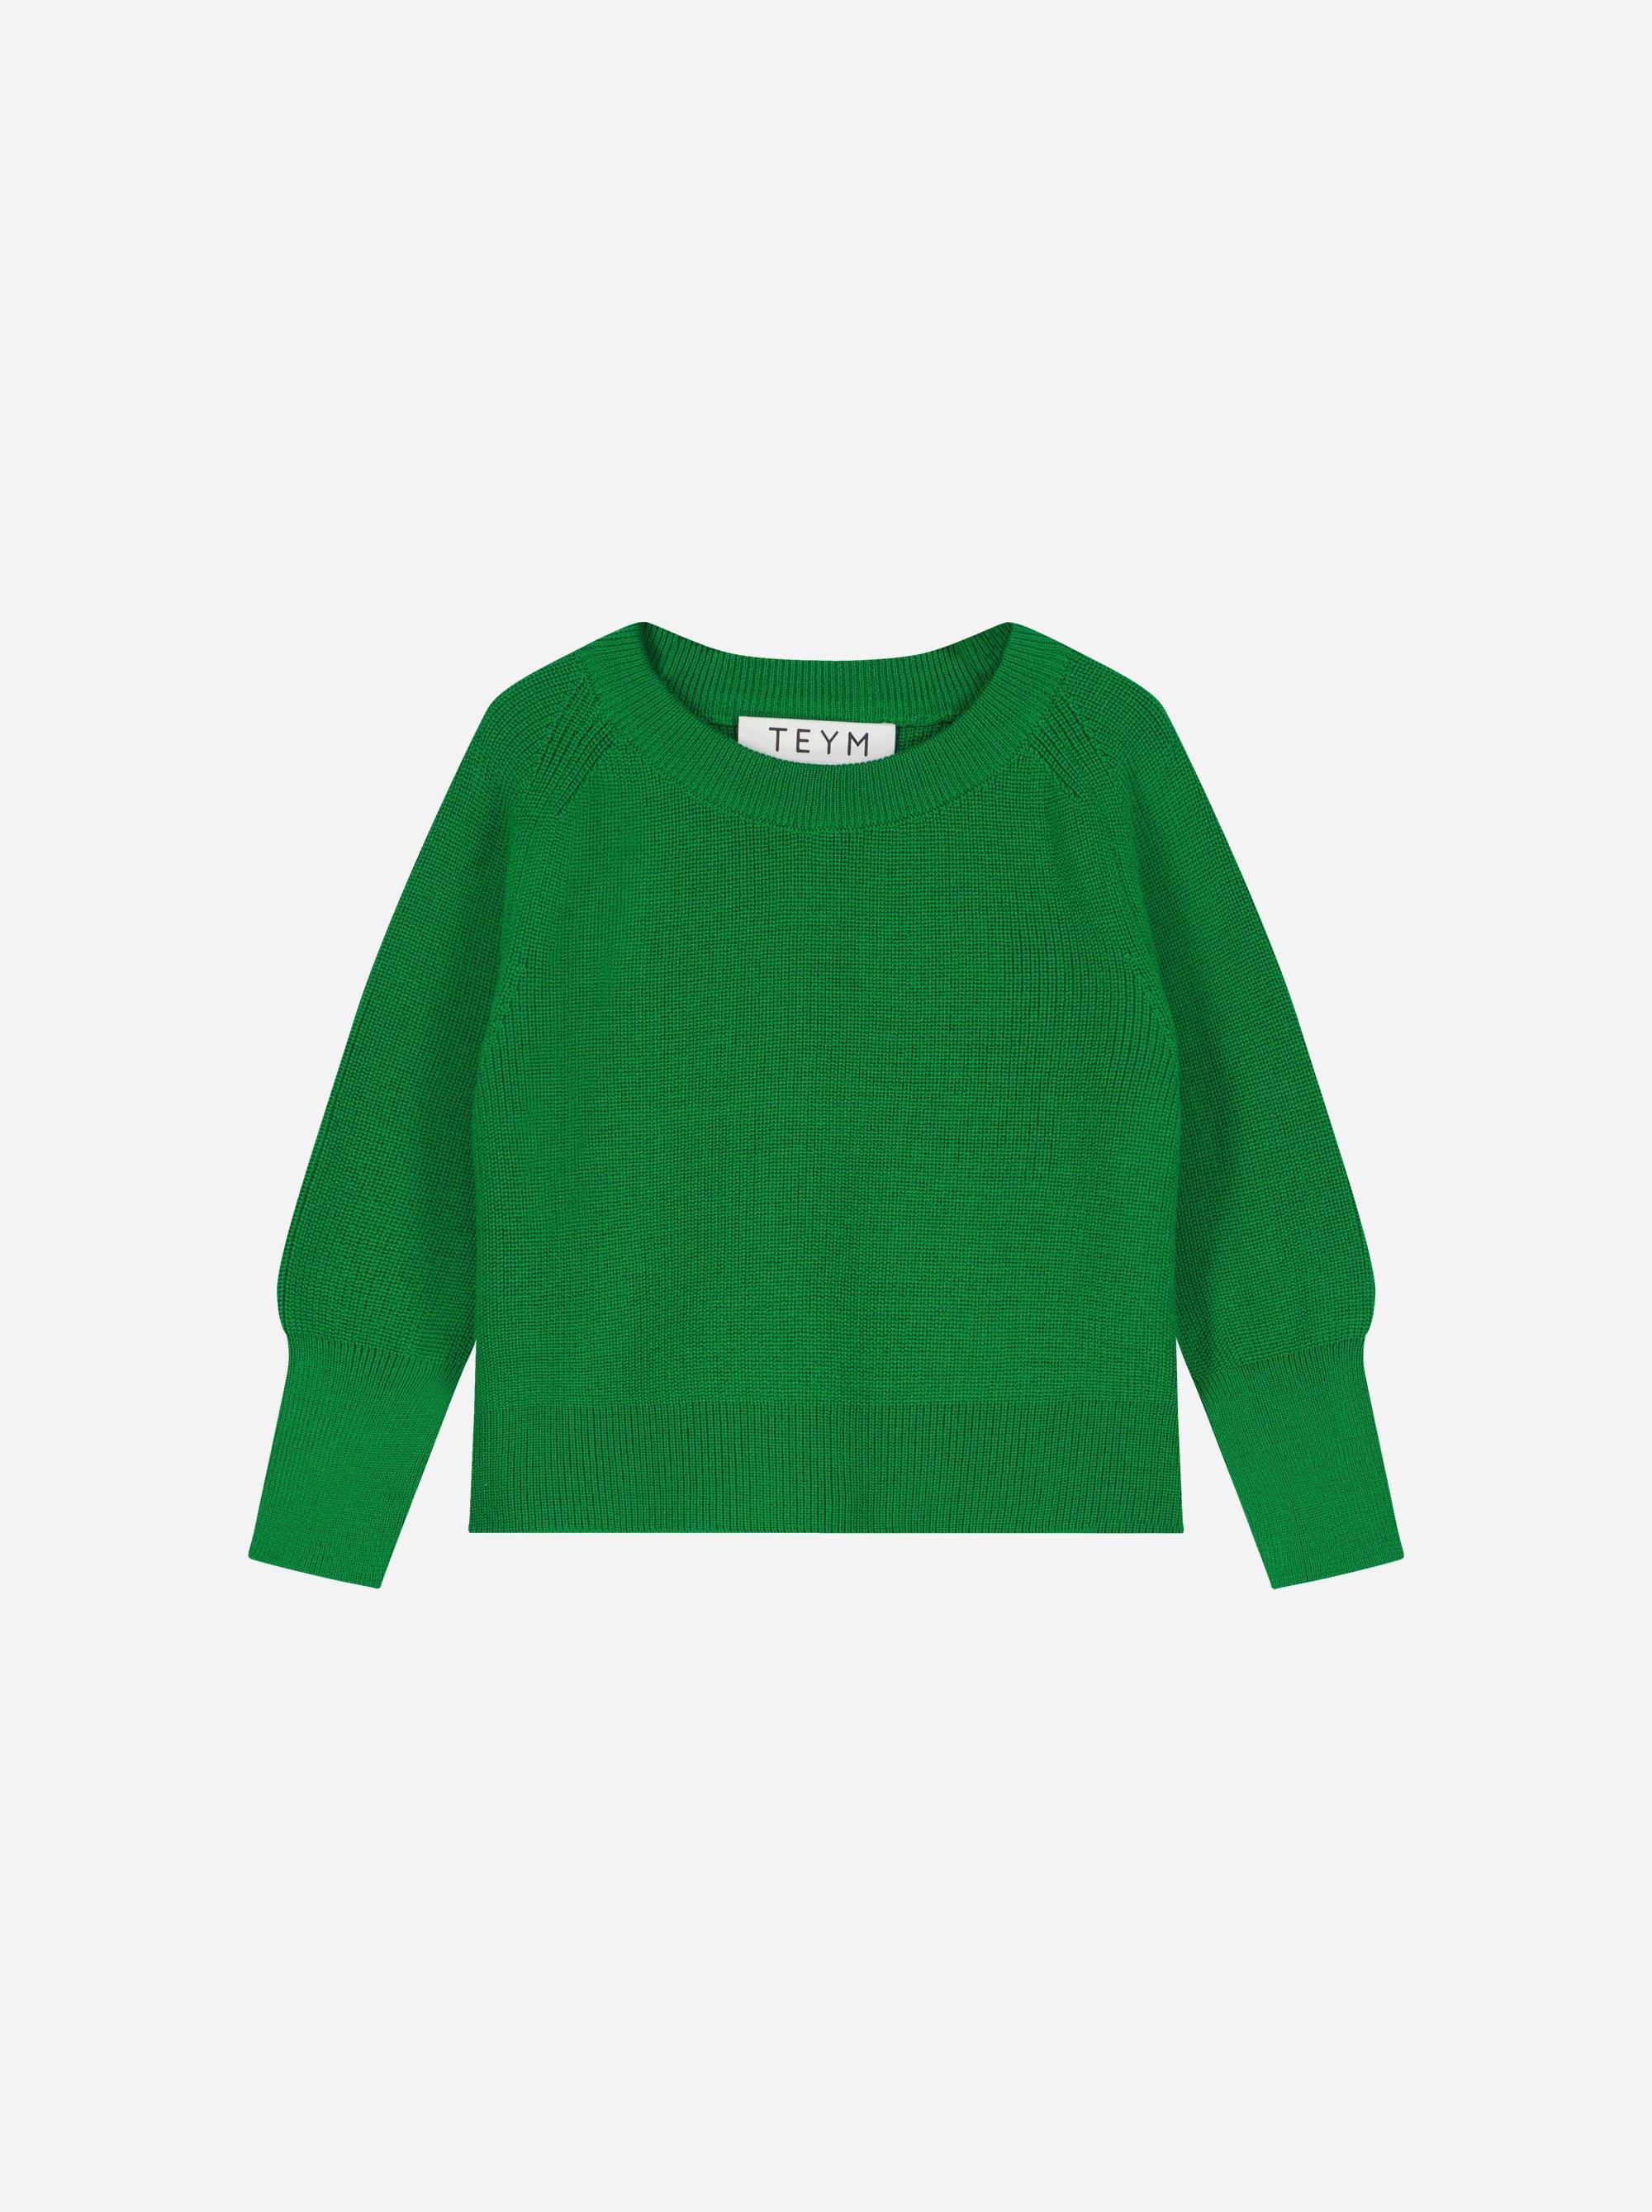 Teym_Merino Sweater_Bright Green_Kids_front_1